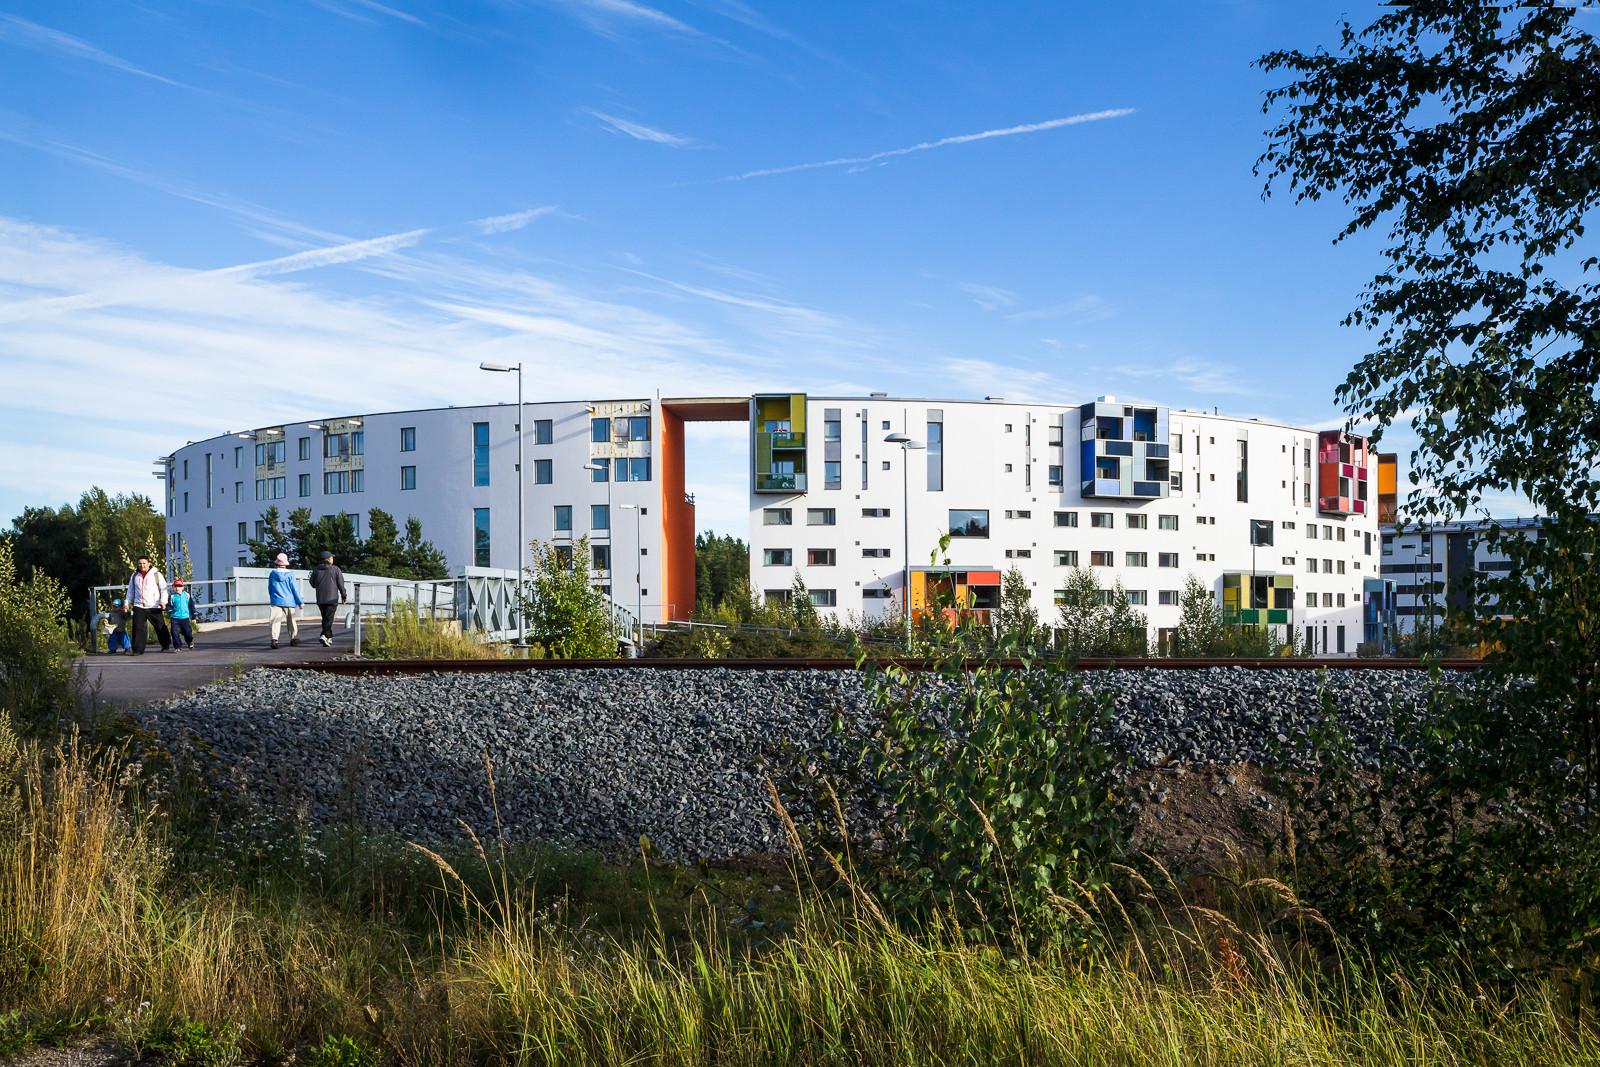 Rainbow Housing Project / ARK-house Architects, © Tiia Ettala